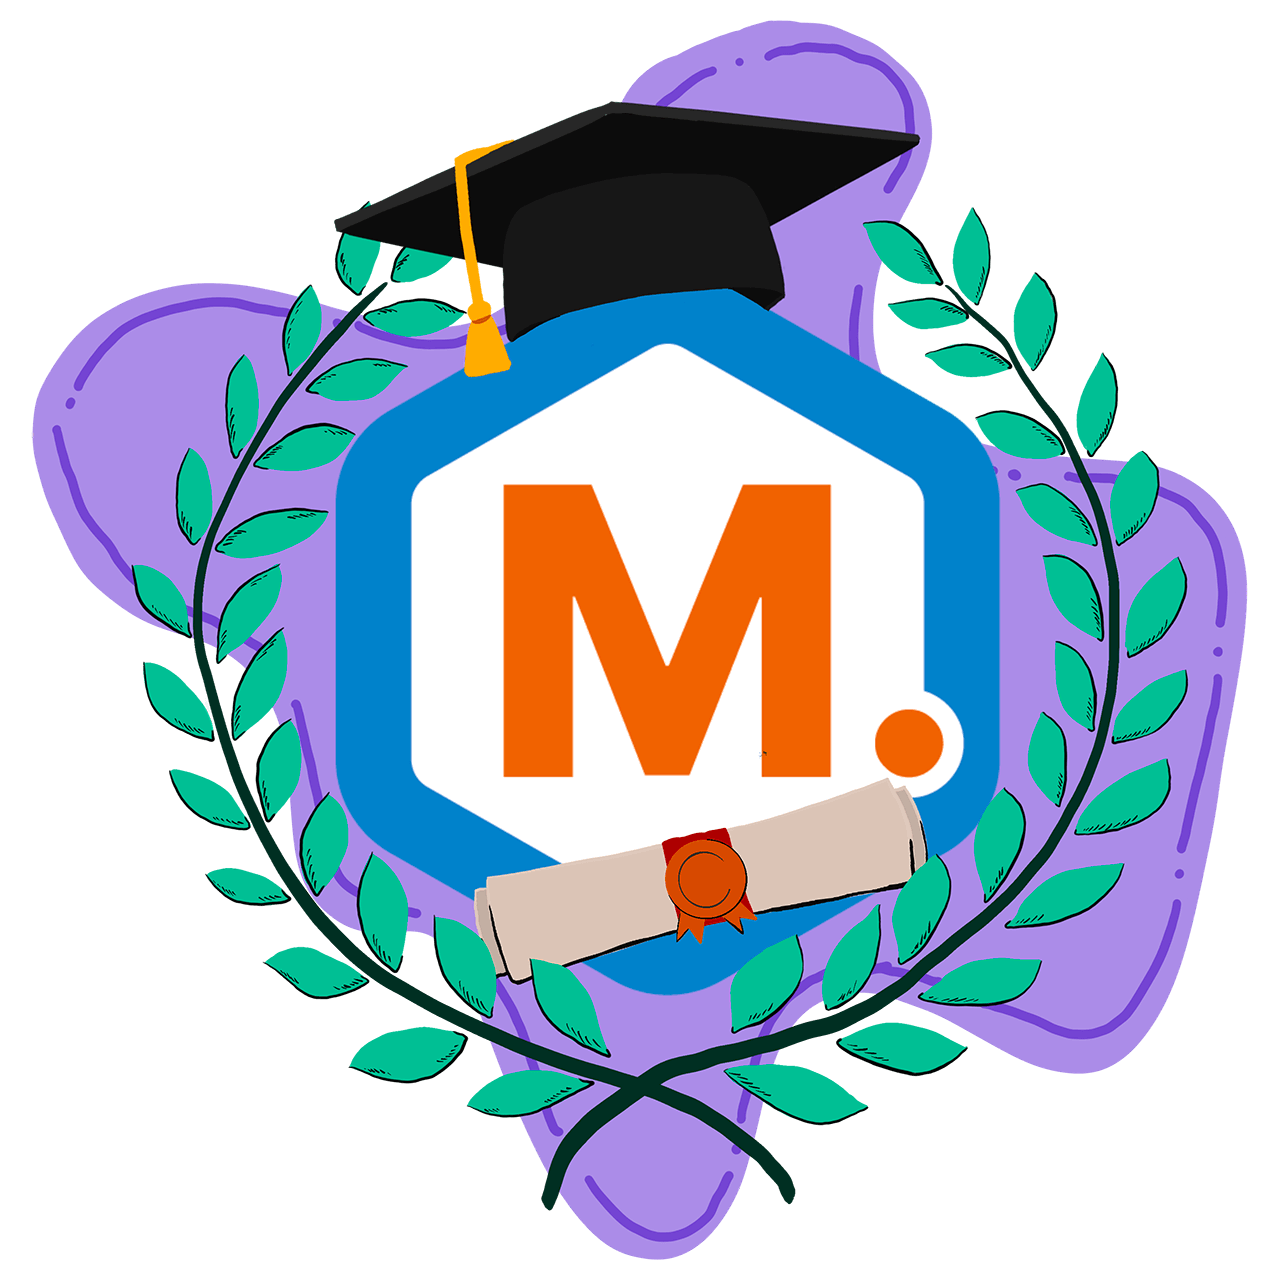 Graduation cap on M.academy